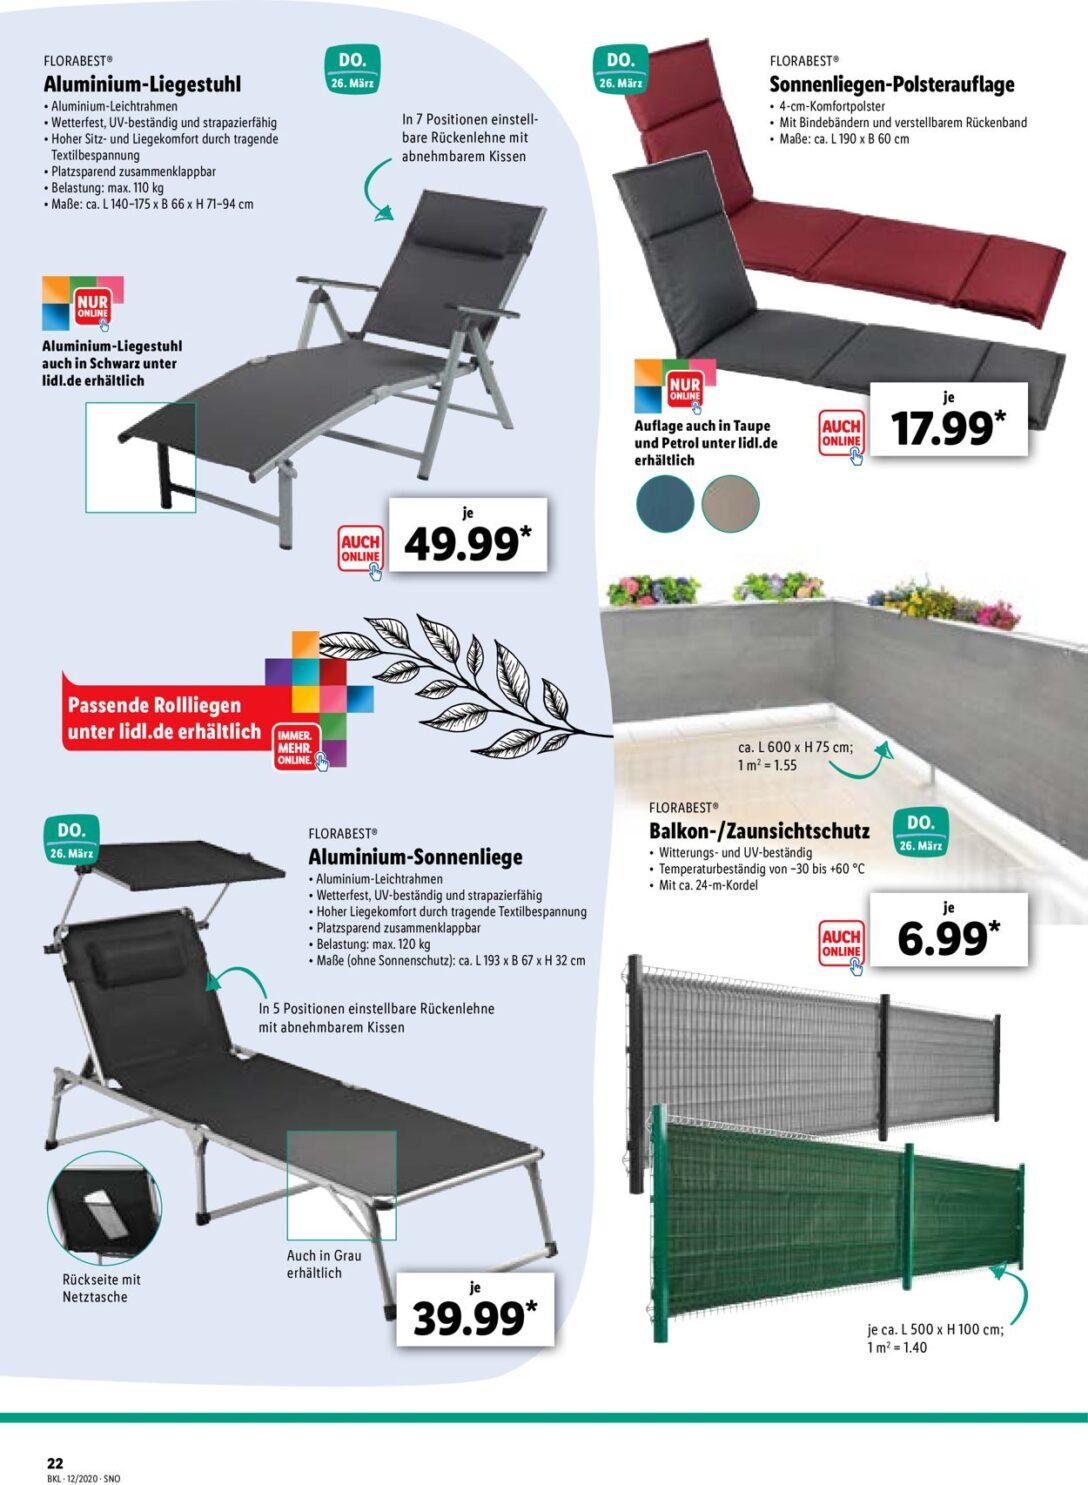 Large Size of Aluminium Liegestuhl Lidl Alu 2020 Camping Garten Schweiz Aktueller Prospekt 2303 31032020 22 Jedewoche Rabattede Wohnzimmer Liegestuhl Lidl